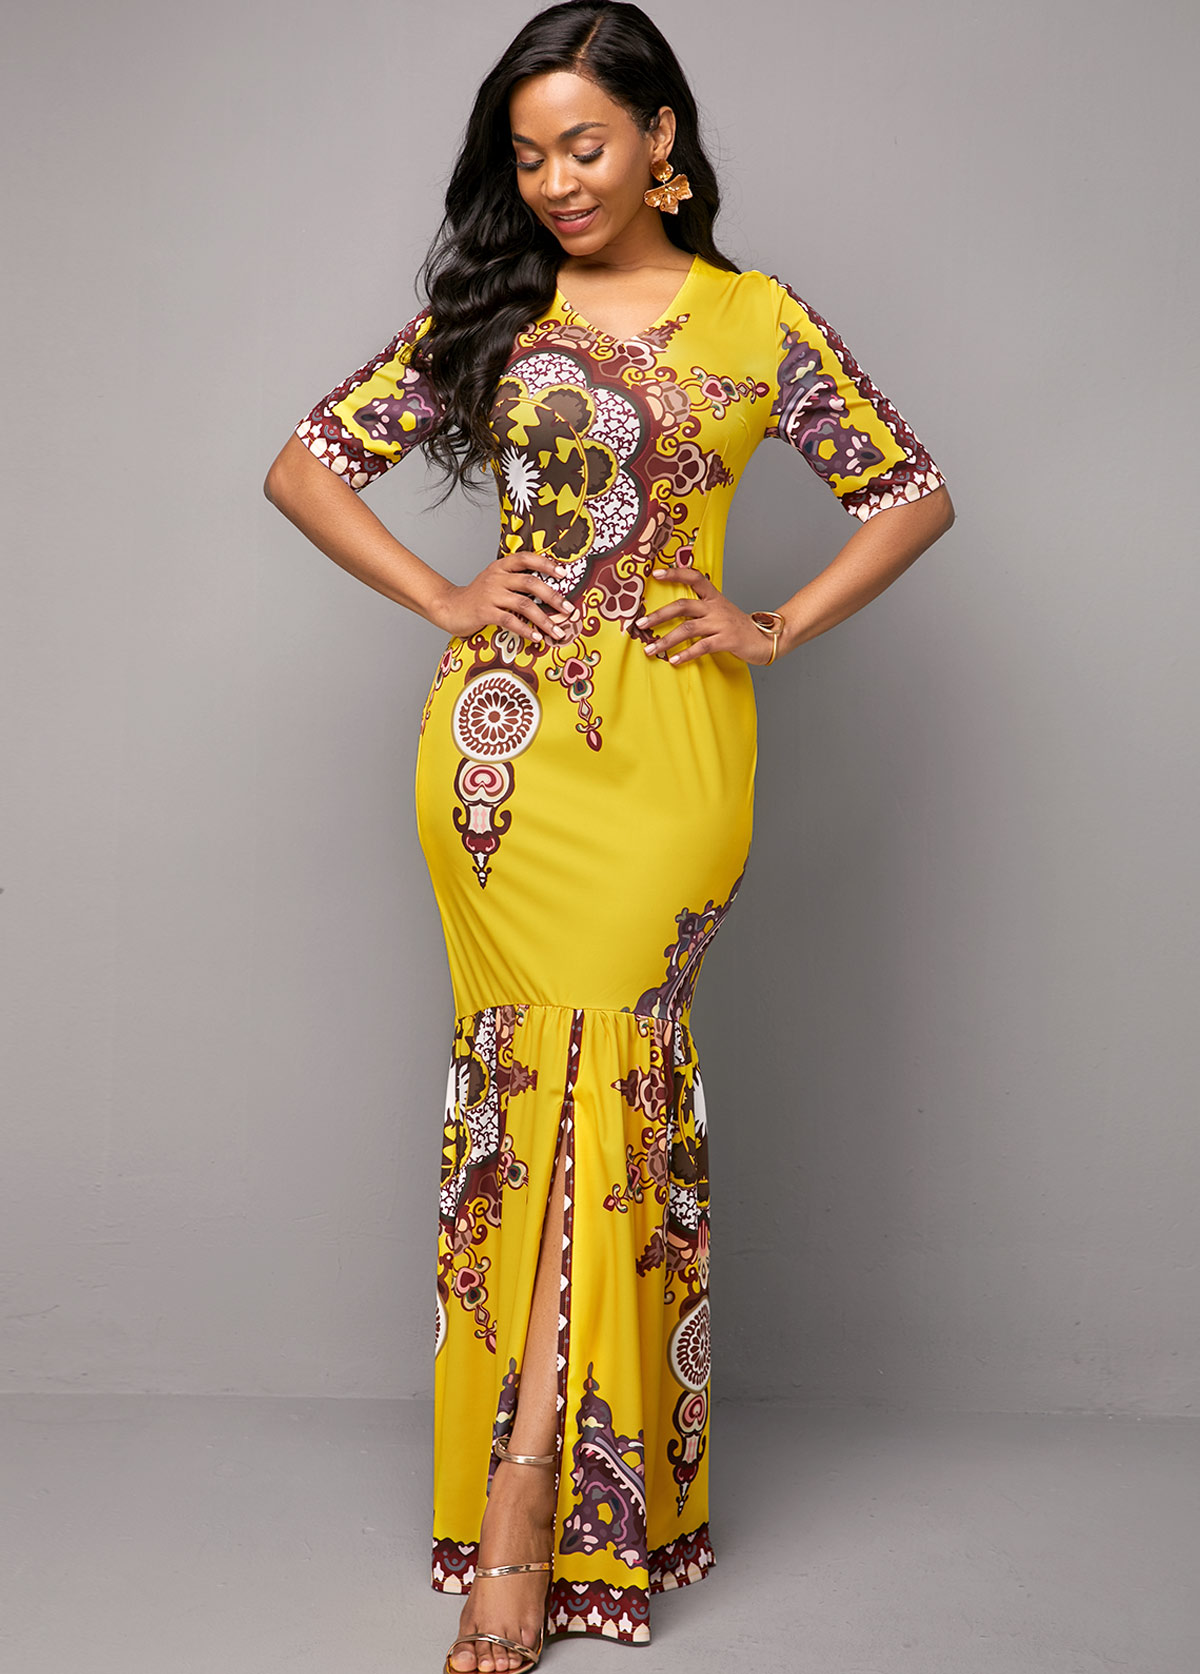 V Neck Yellow Tribal Print Dress